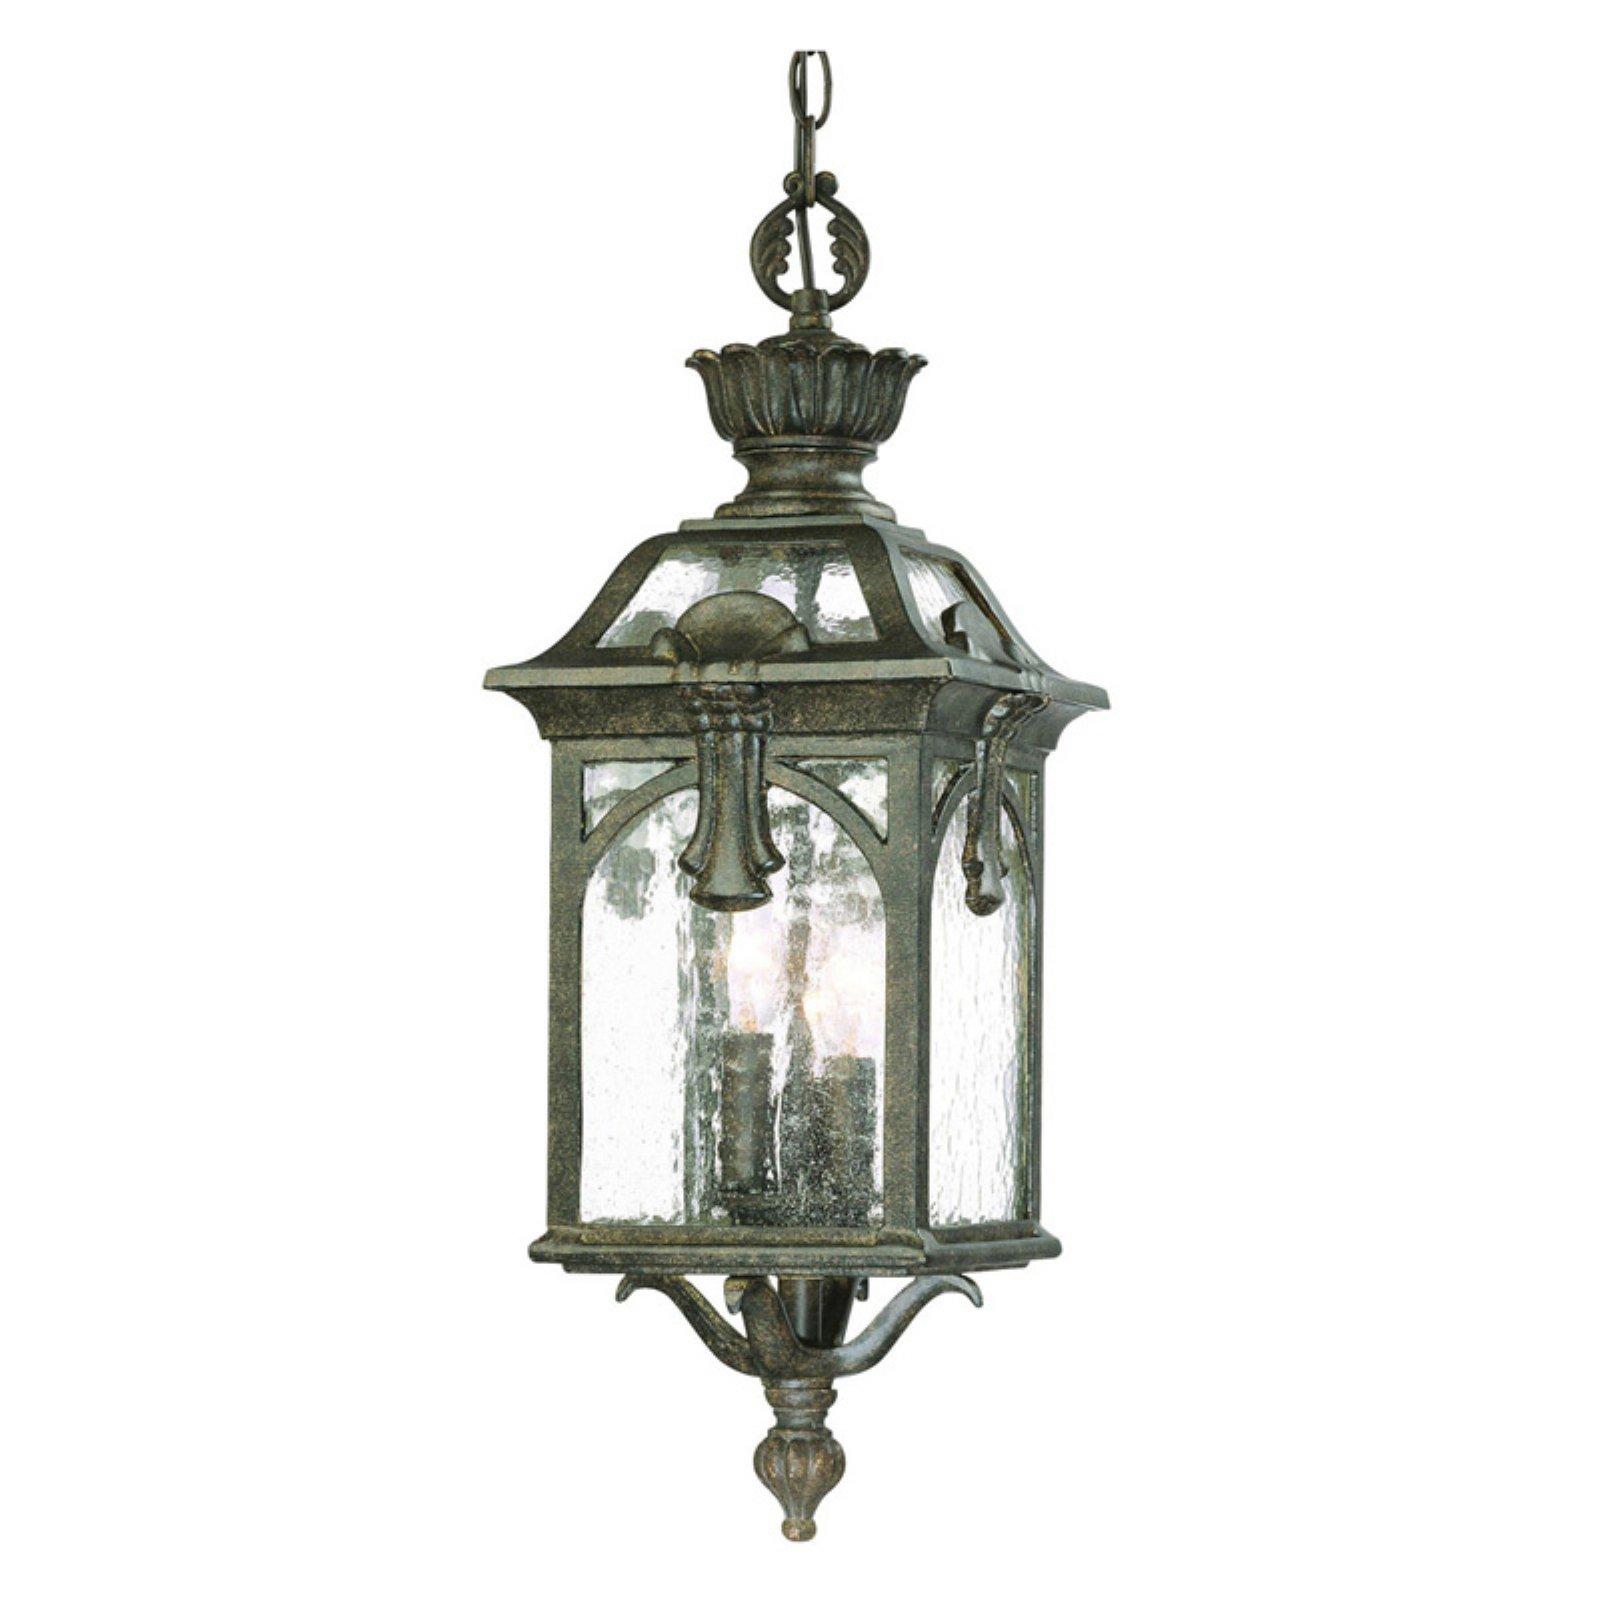 Acclaim Lighting Belmont Outdoor Hanging Lantern Light Fixture